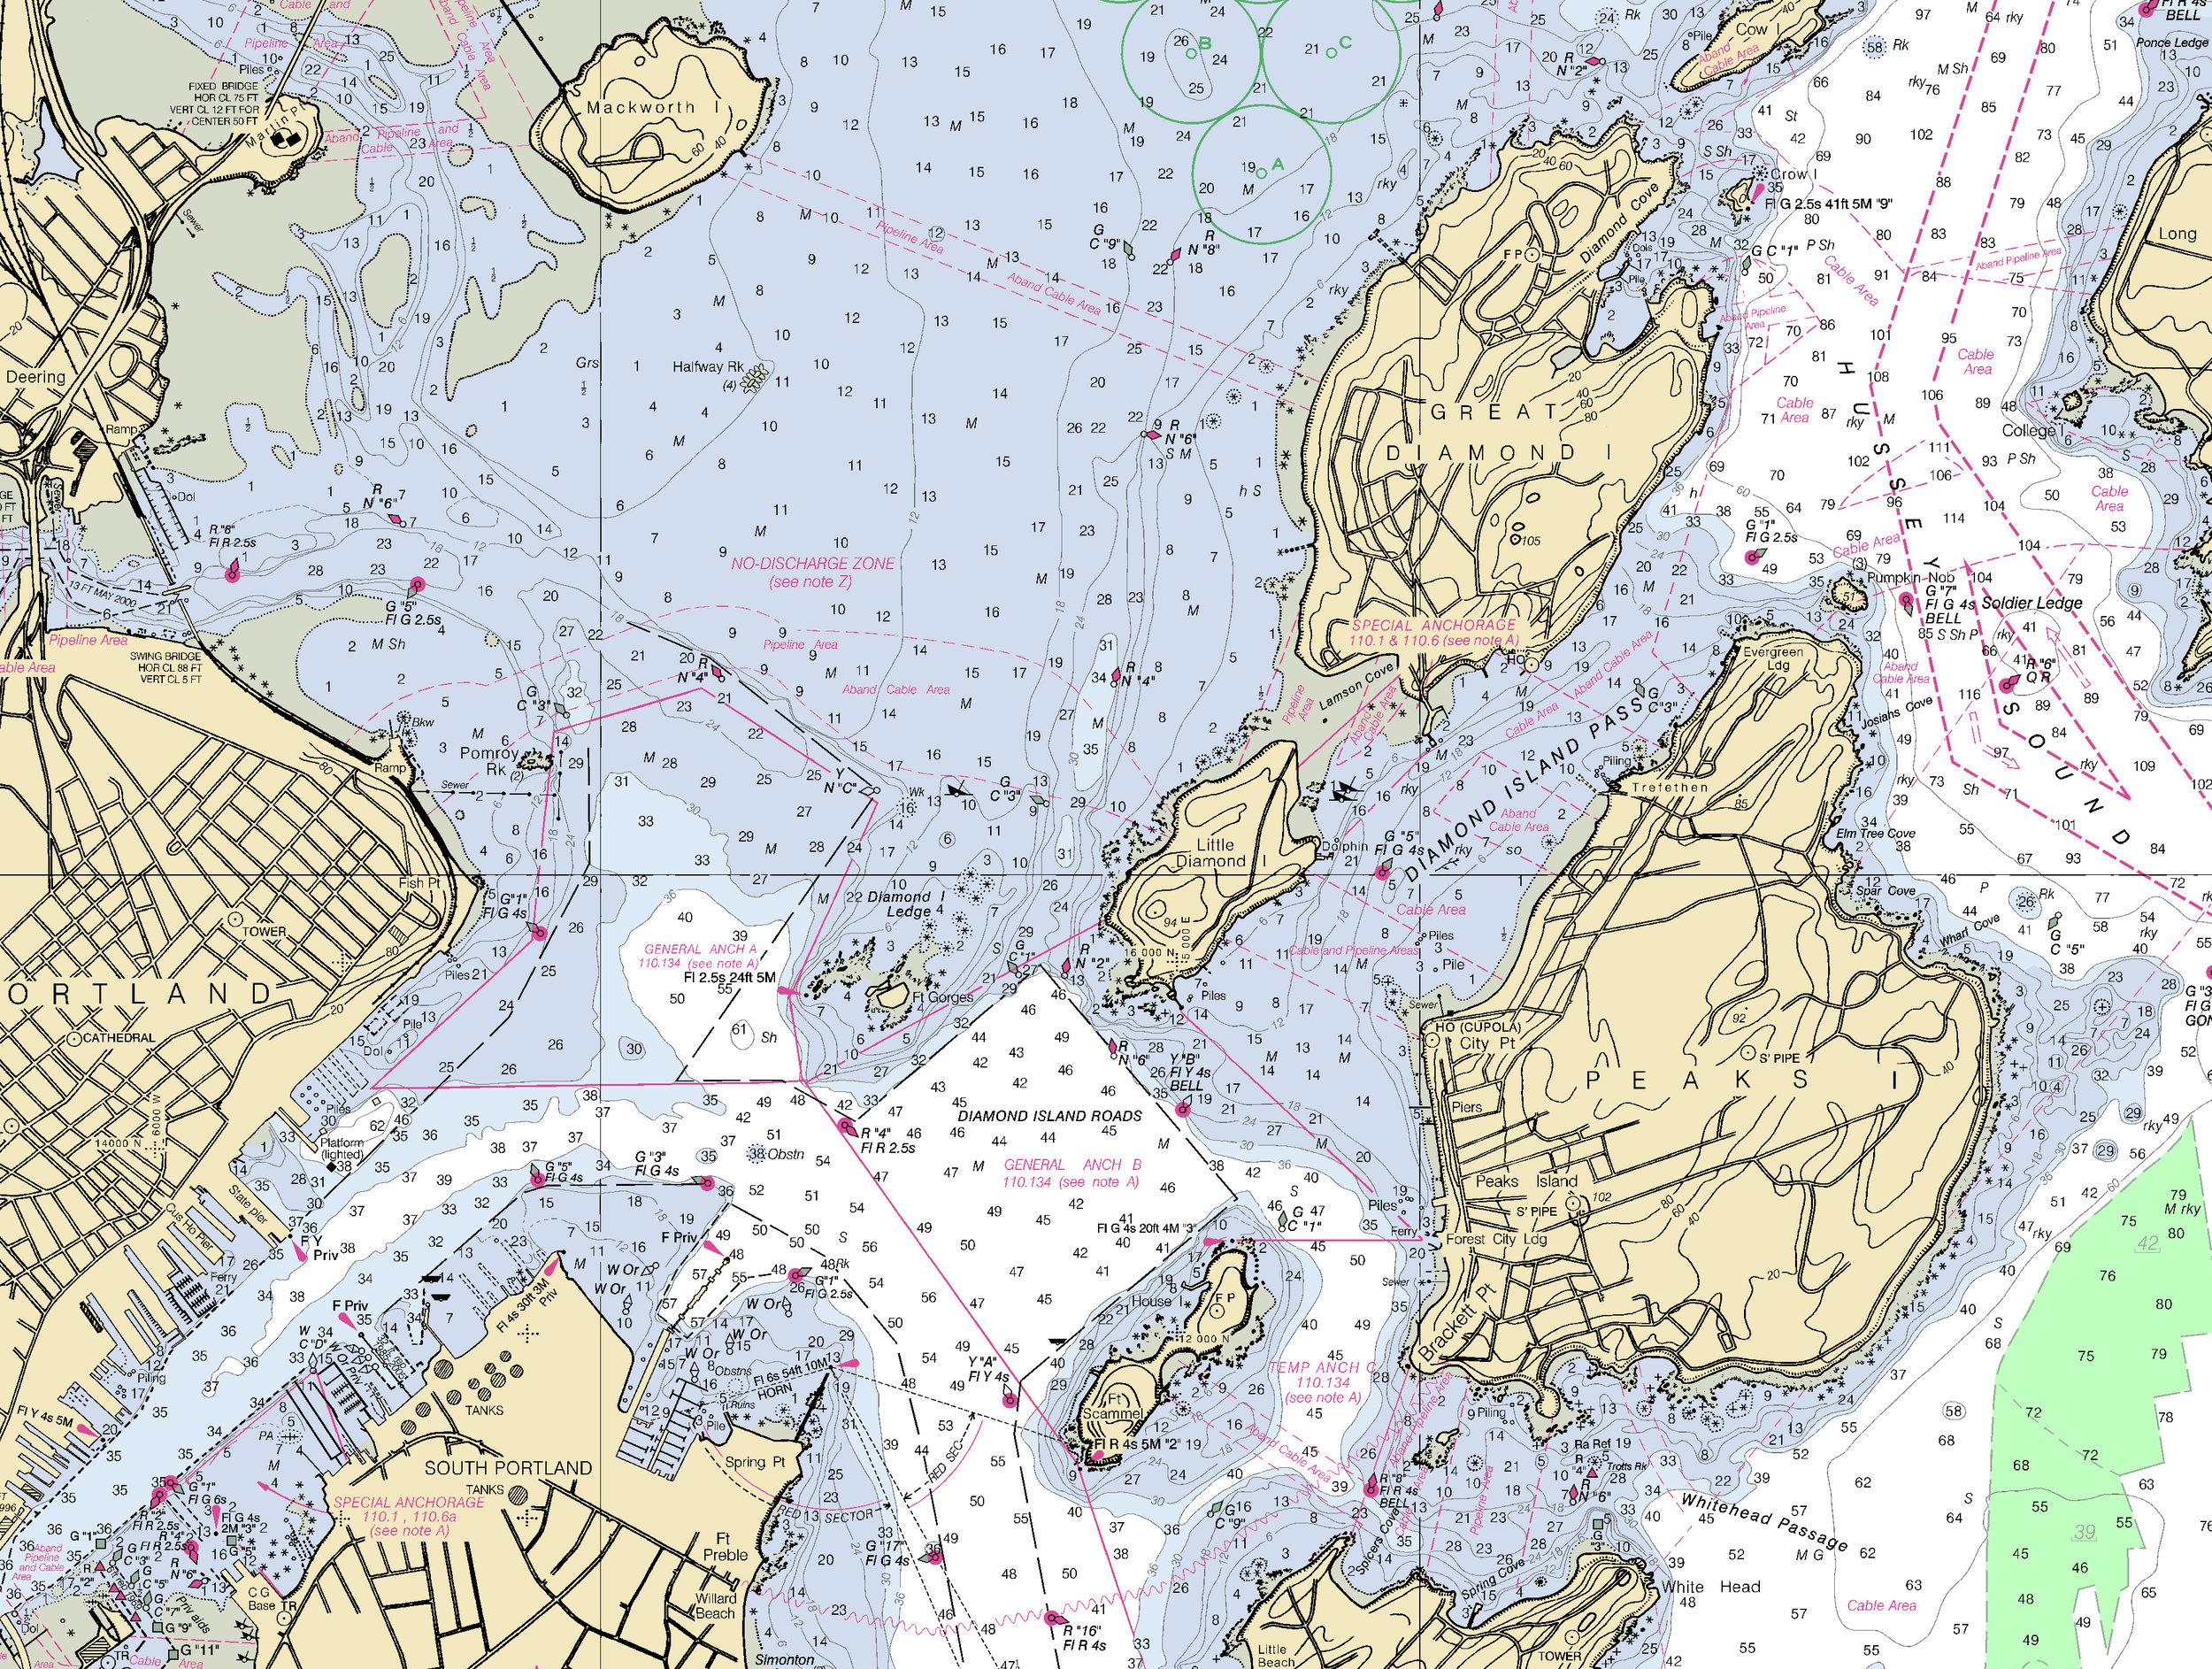 ocean skills series -